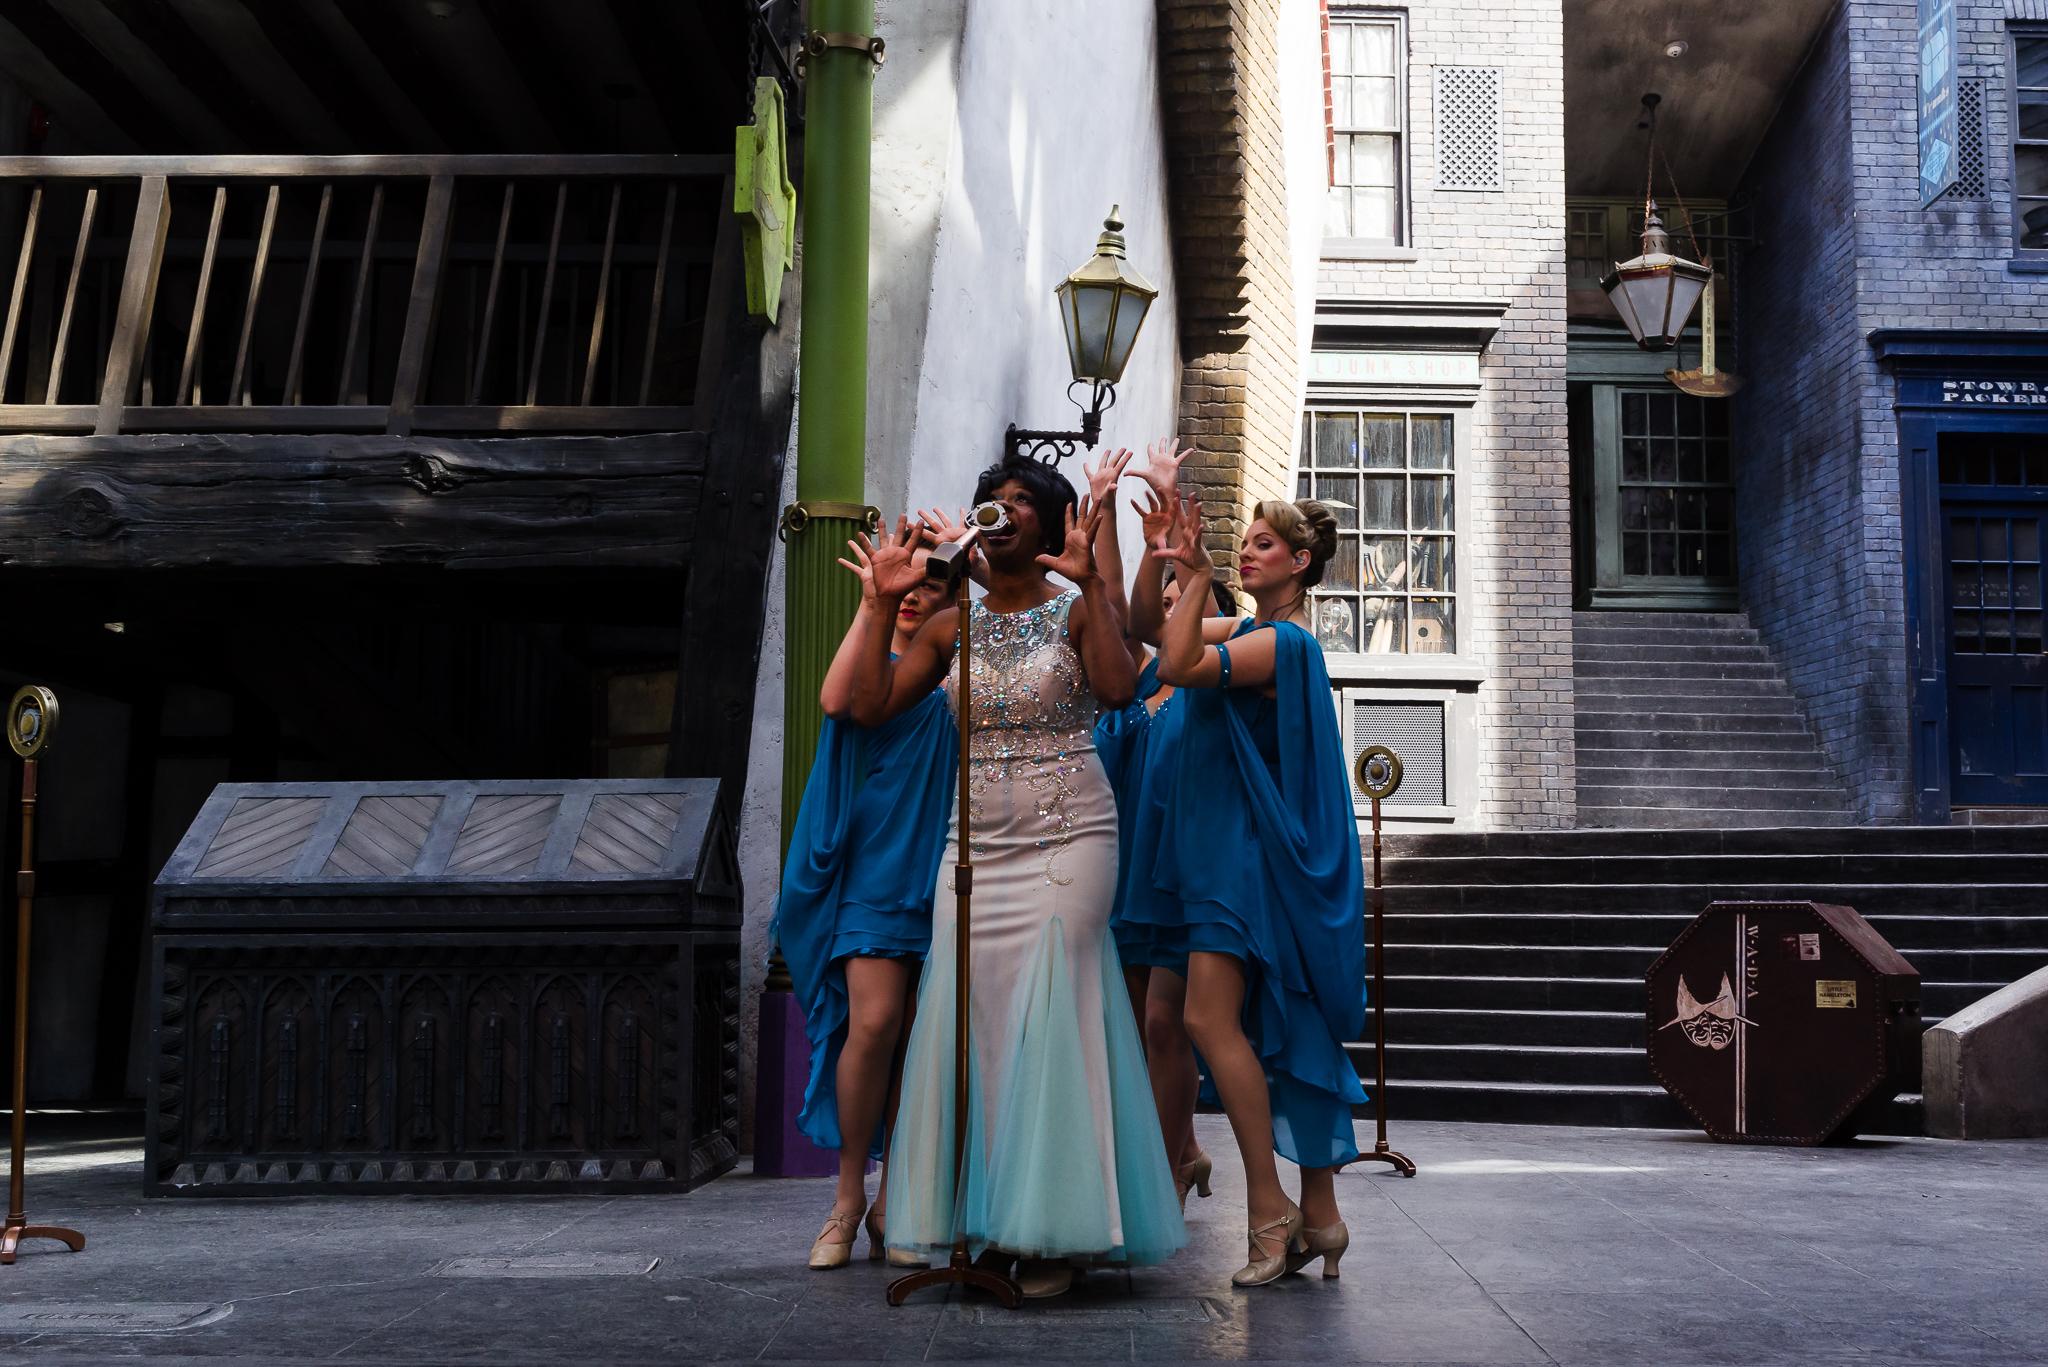 Celestine Warbeck and her Banshees. / 3/5/16 / Universal Studios / Orlando, FL